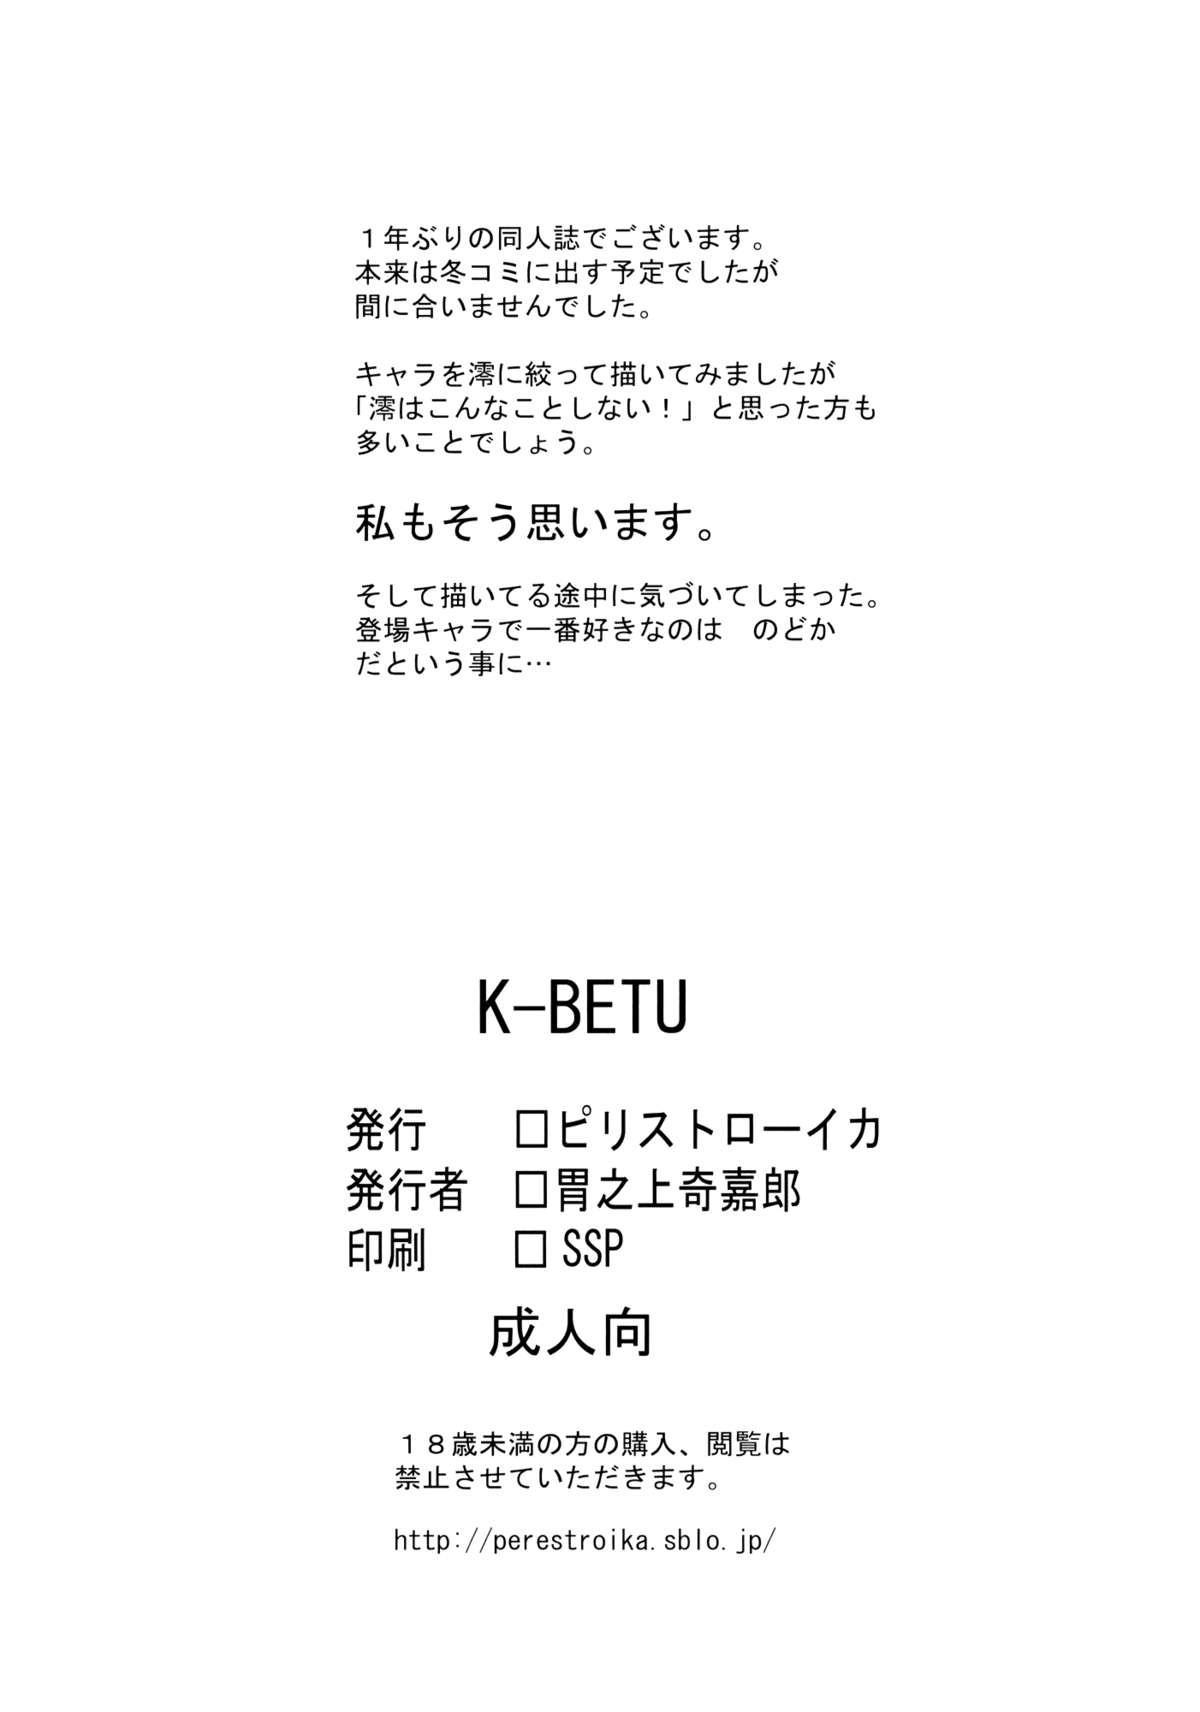 K-BETU 20